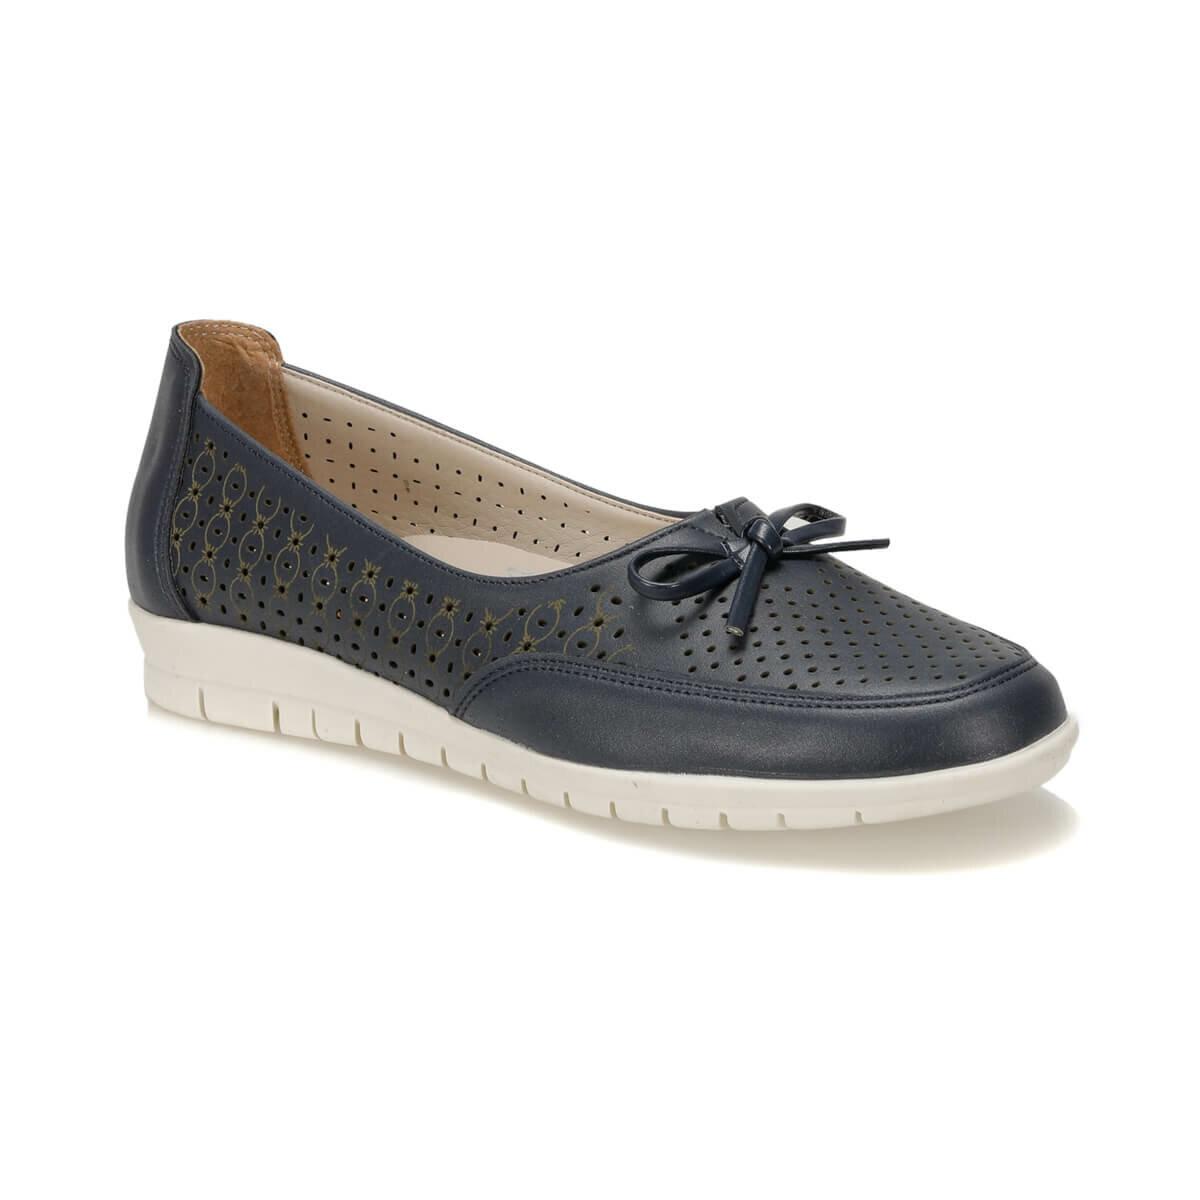 FLO 91.100683.Z Navy Blue Women 'S Shoes Polaris 5 Point